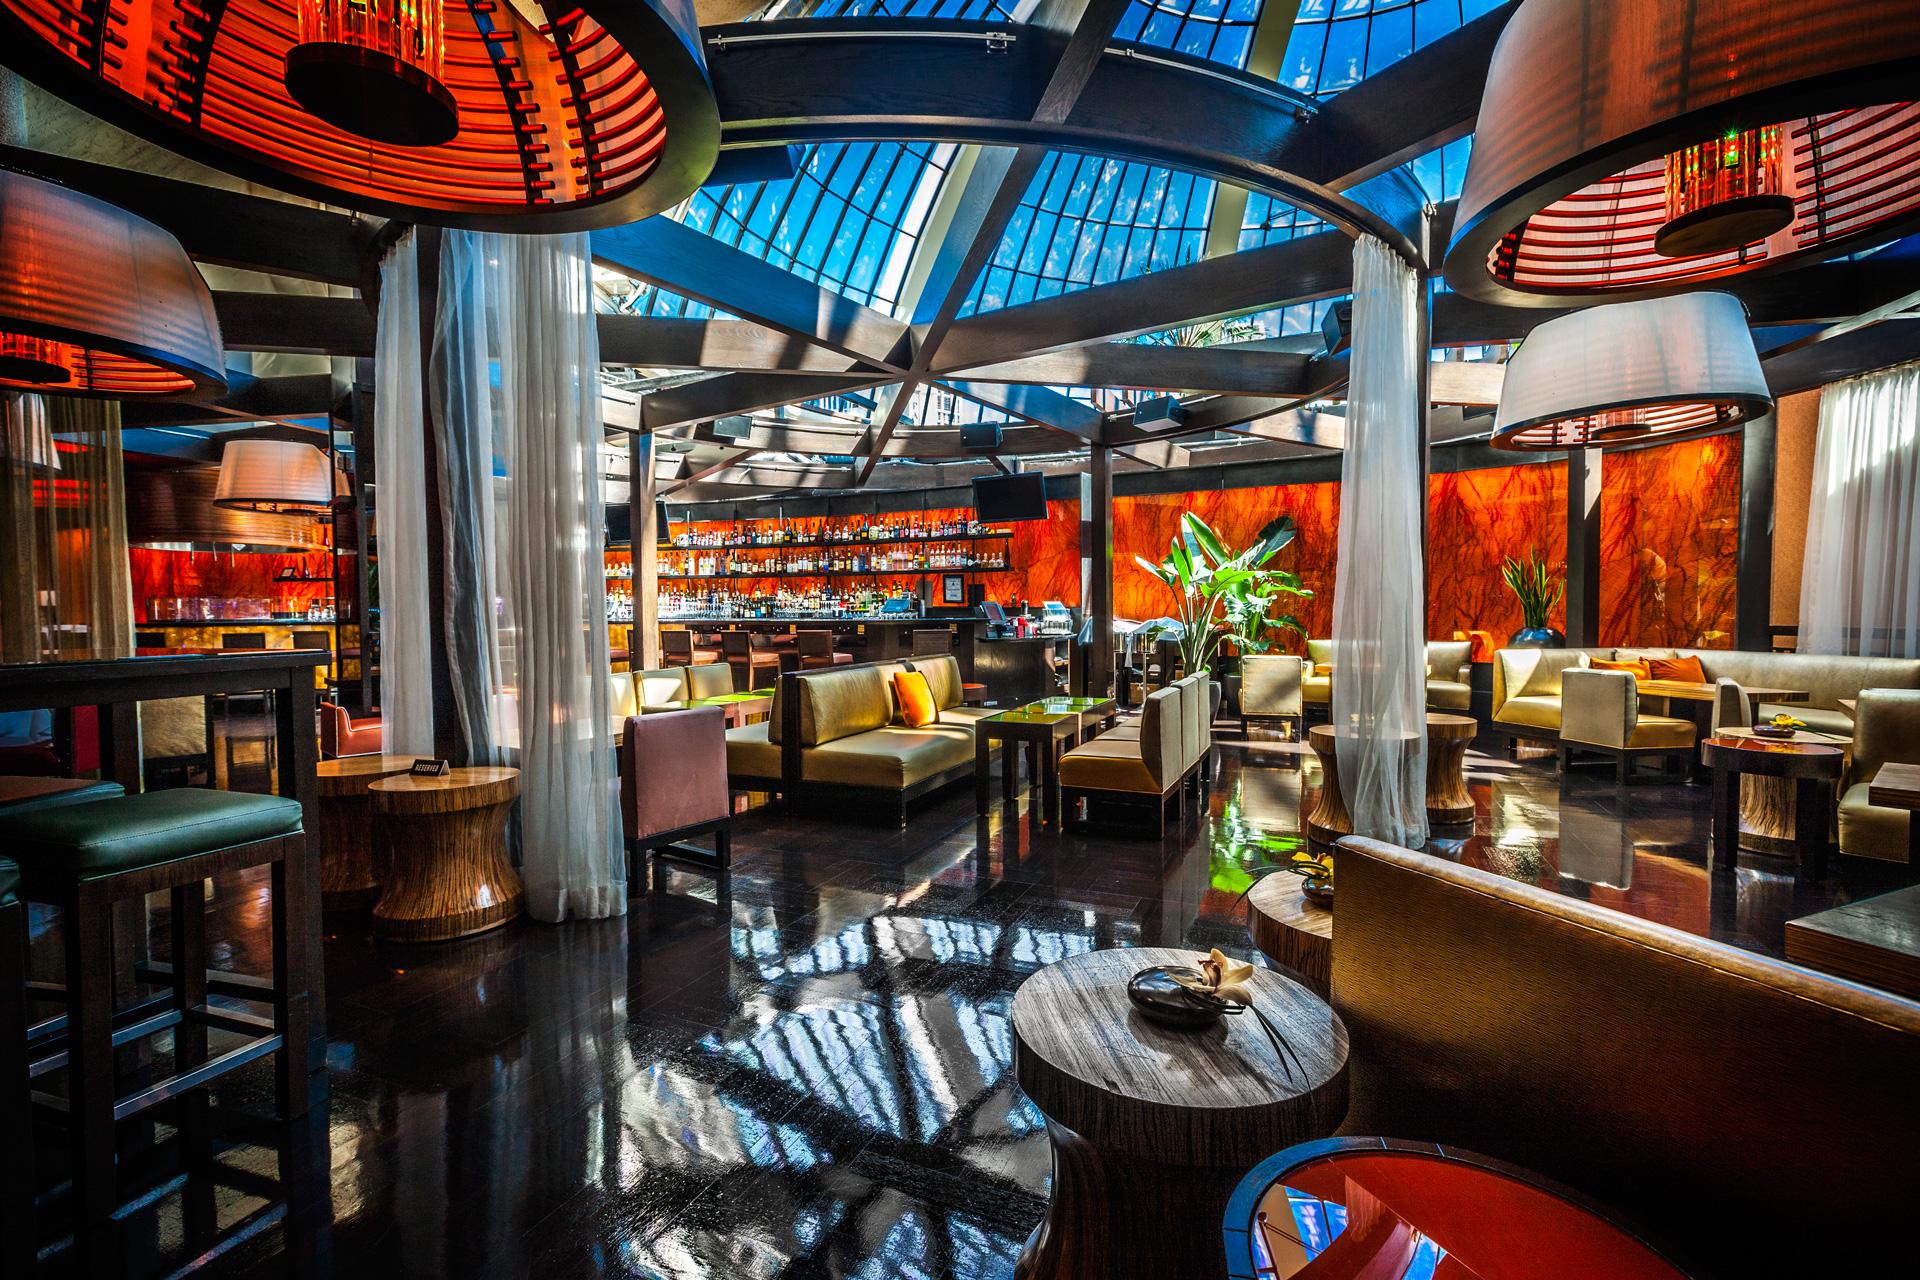 Mirage Hotel Otoro Robata Grill & Sushi